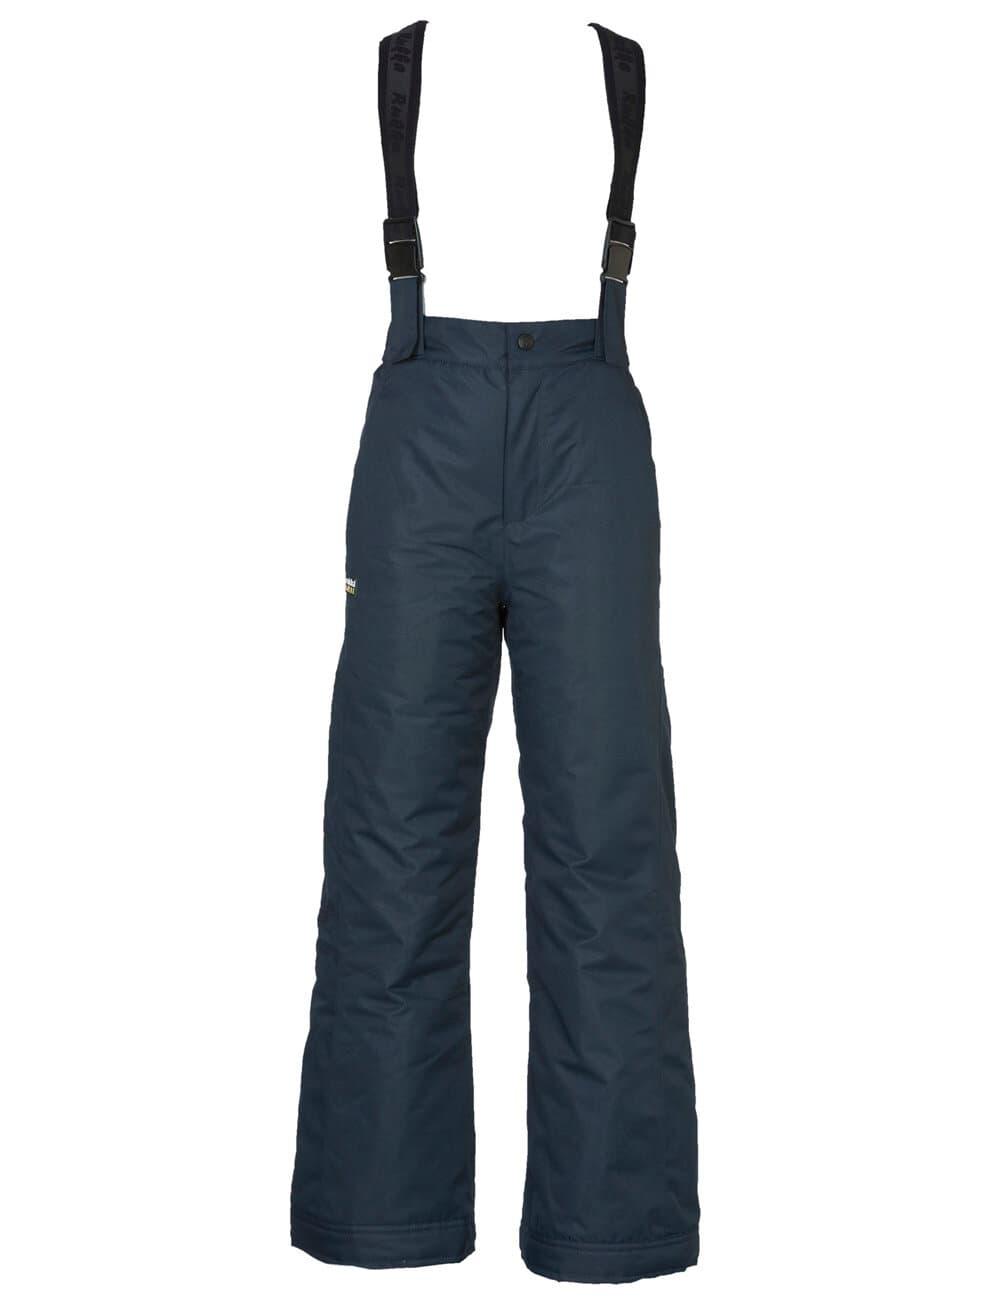 Rukka Racer Pantaloni da sci per bambini